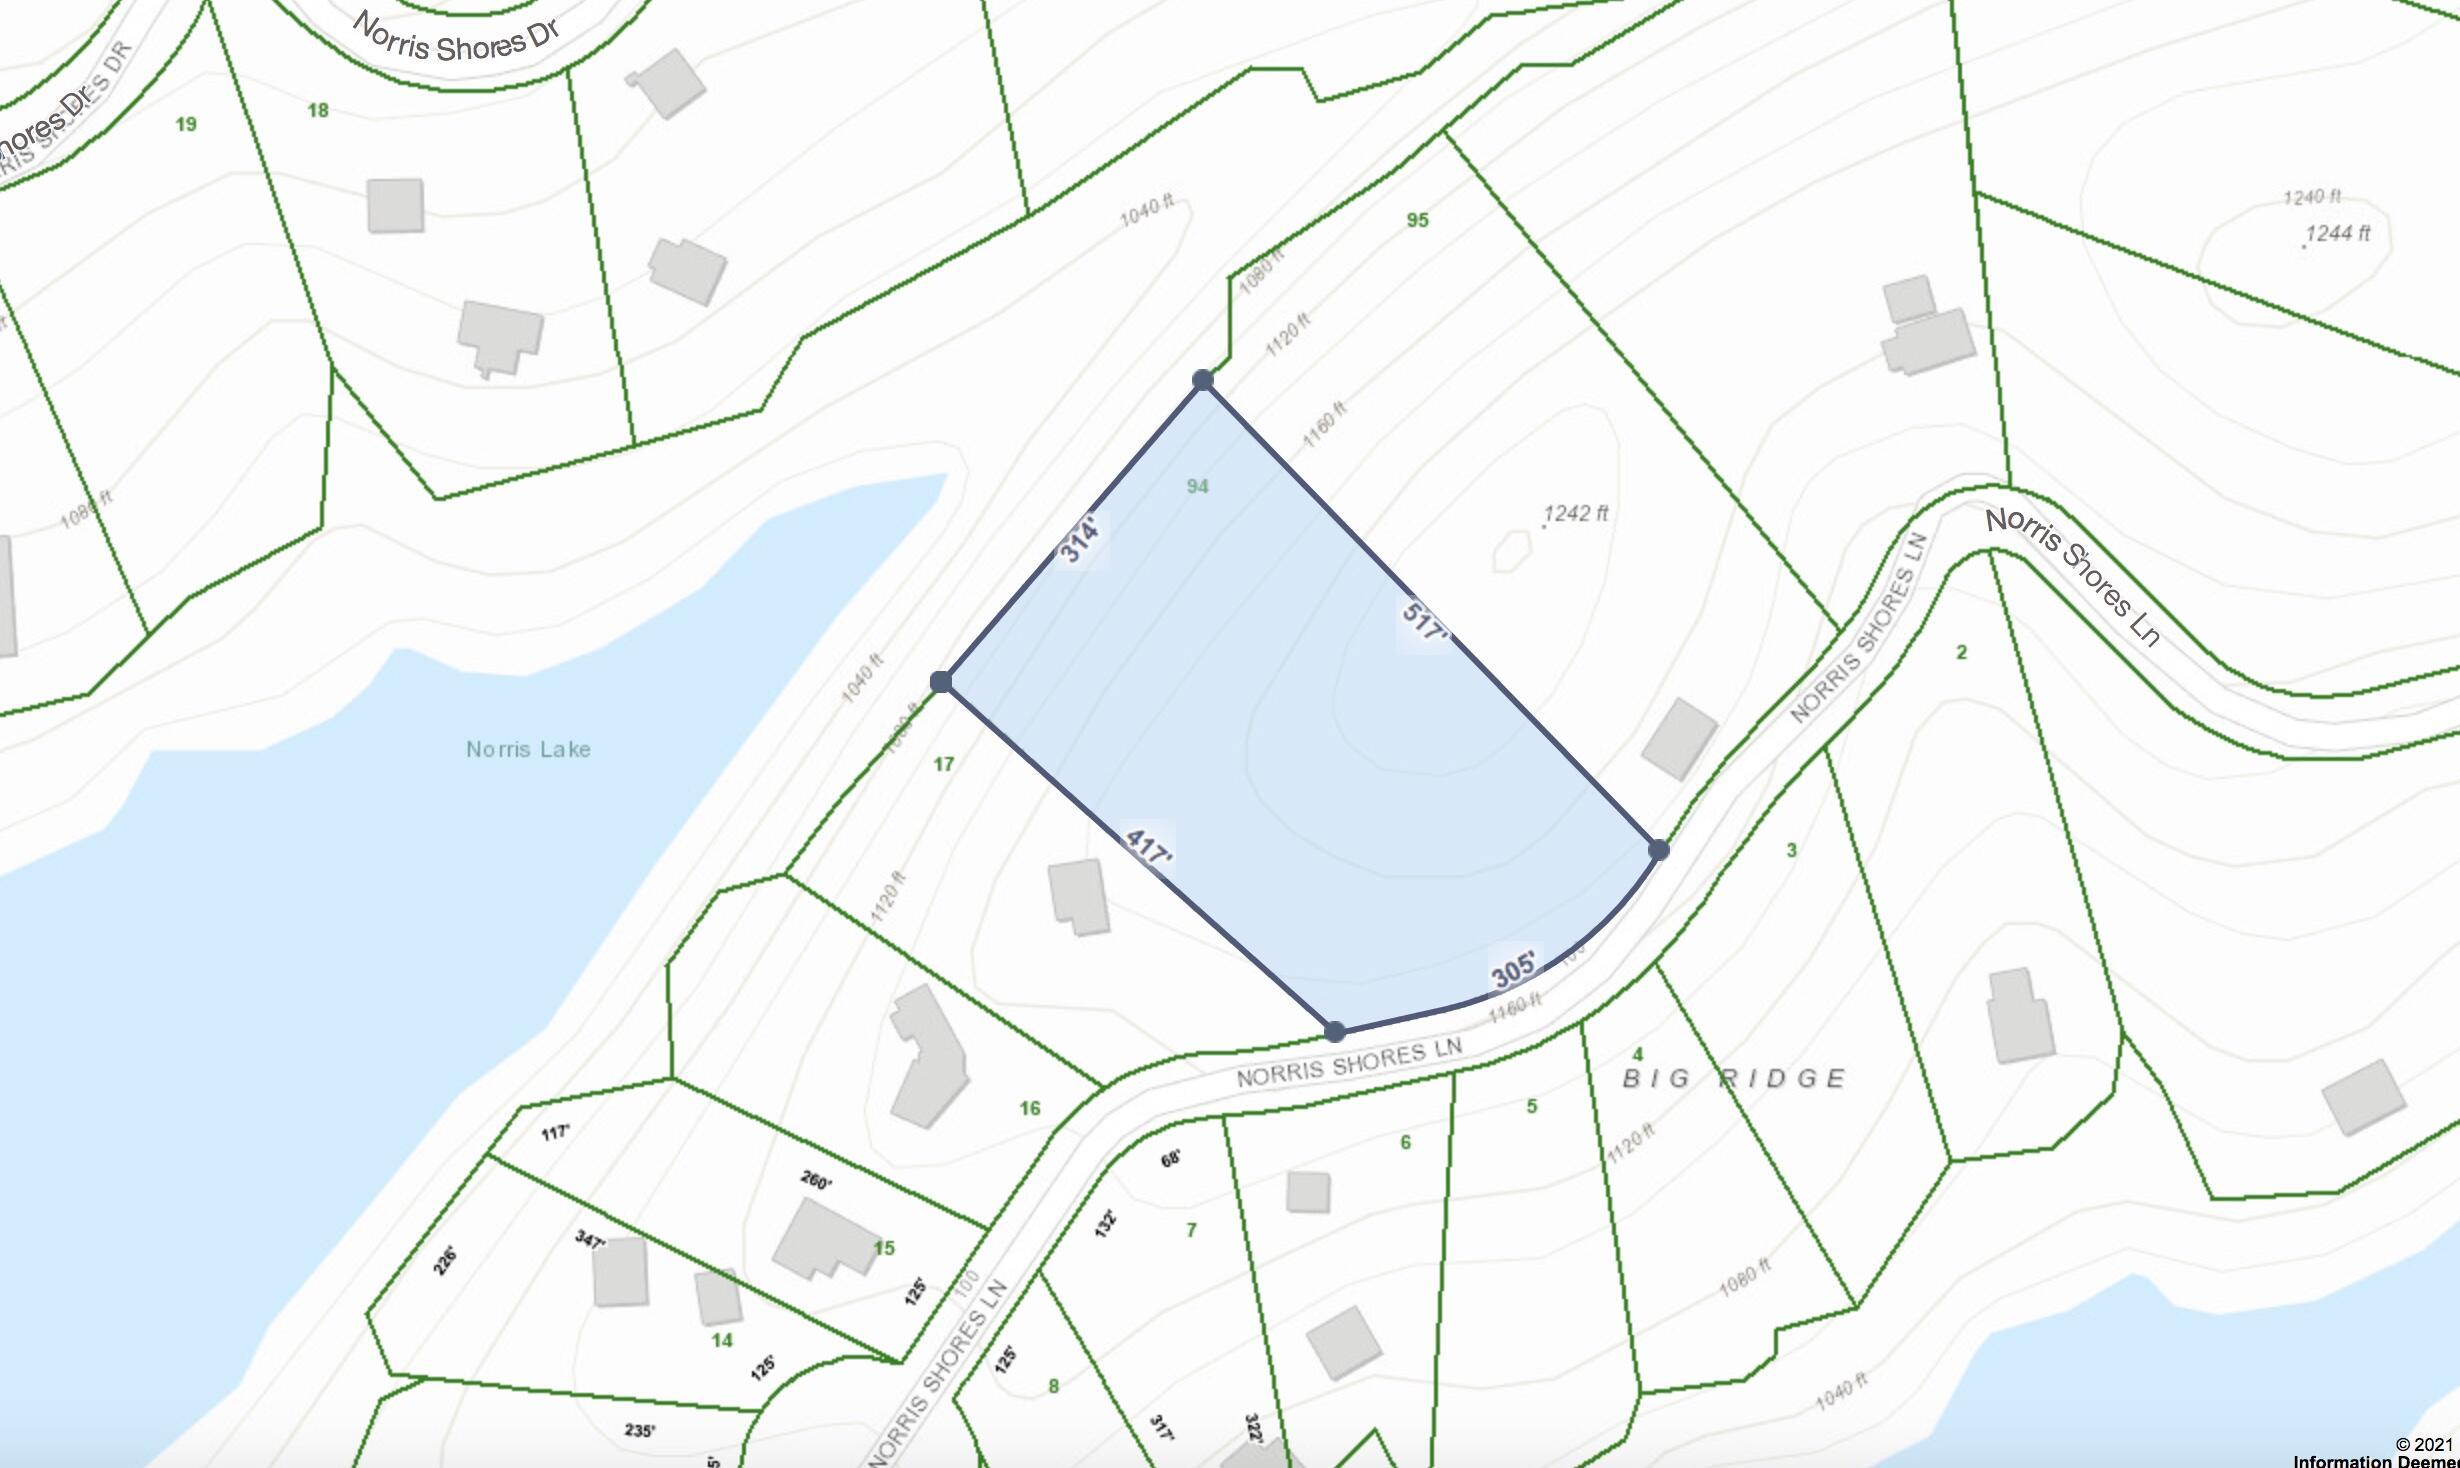 Lot 94 Norris Shores Ln: